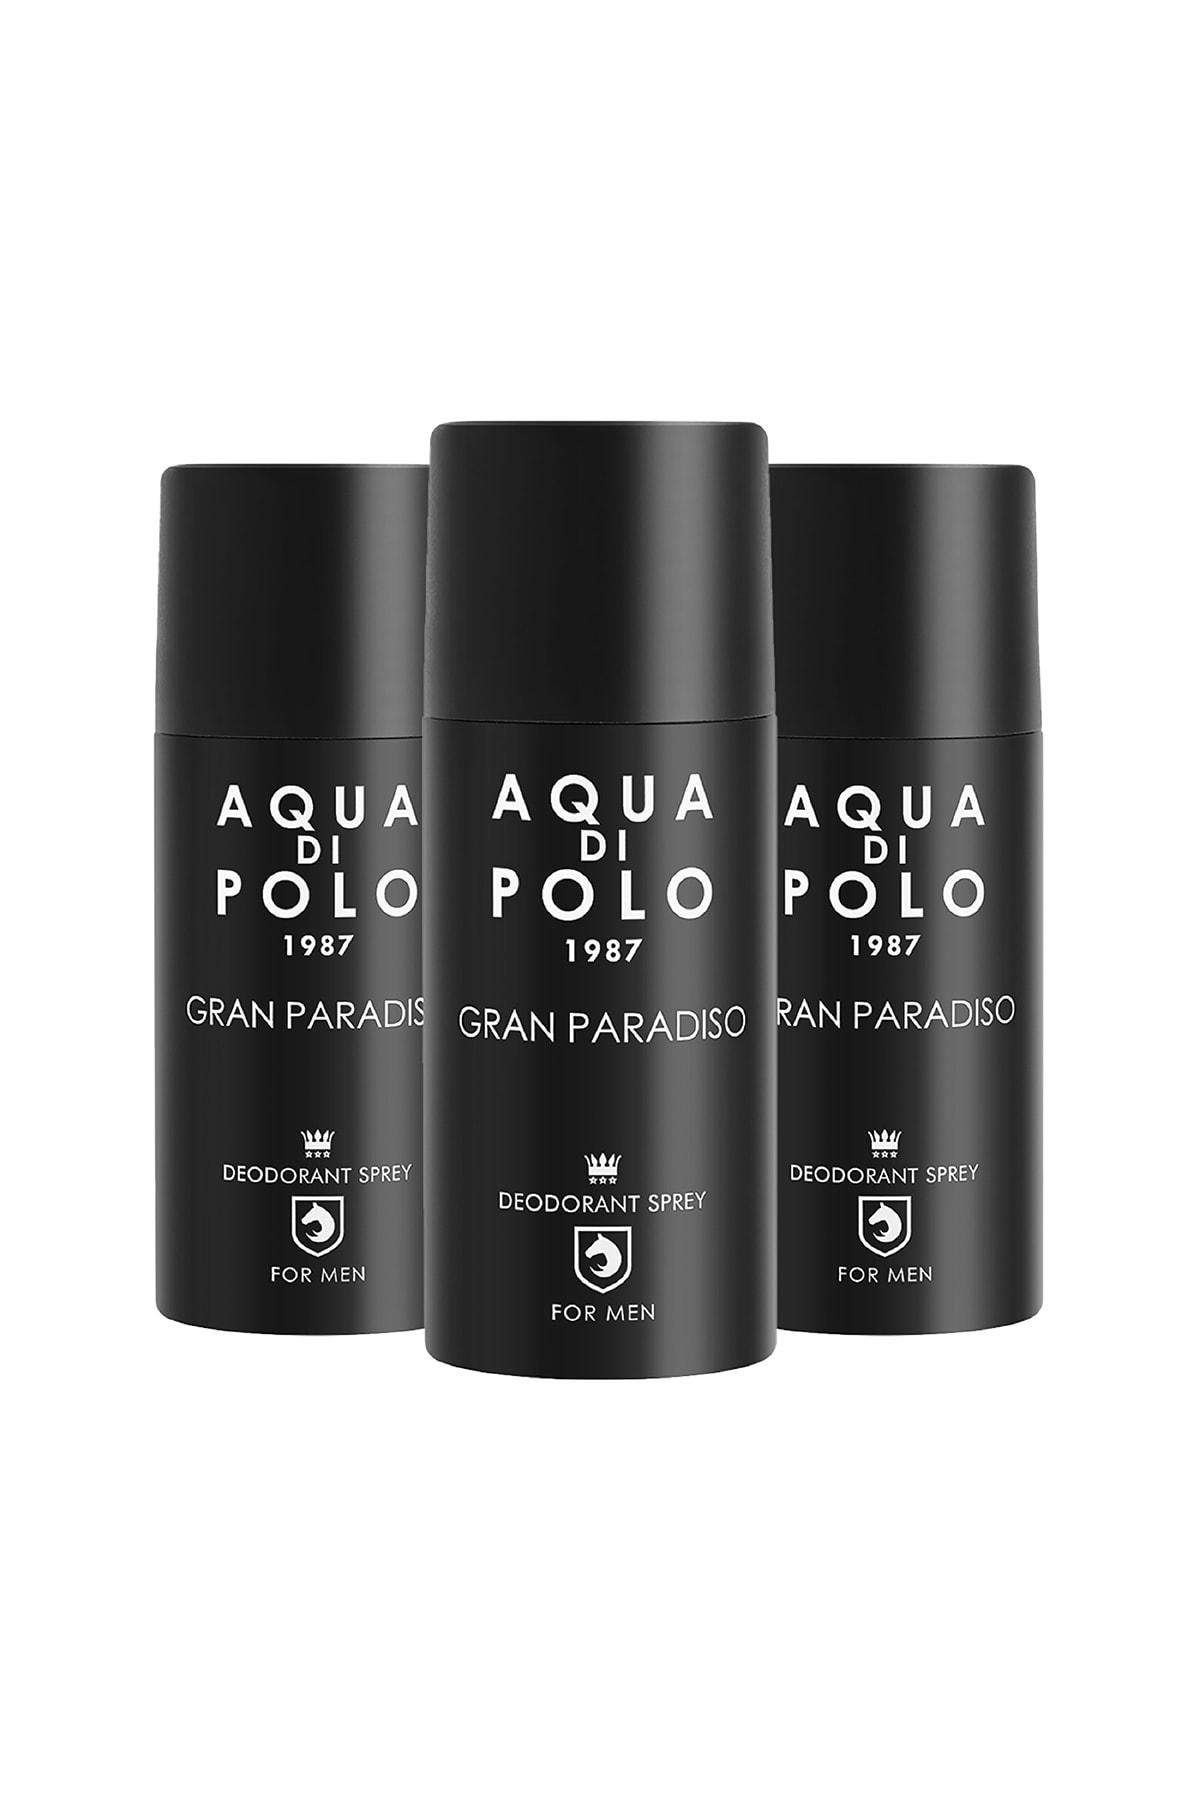 Aqua Di Polo 1987 Aqua Di Polo Gran Paradiso 3'lü Parfümlü Deodorant Seti Stcc004401 1